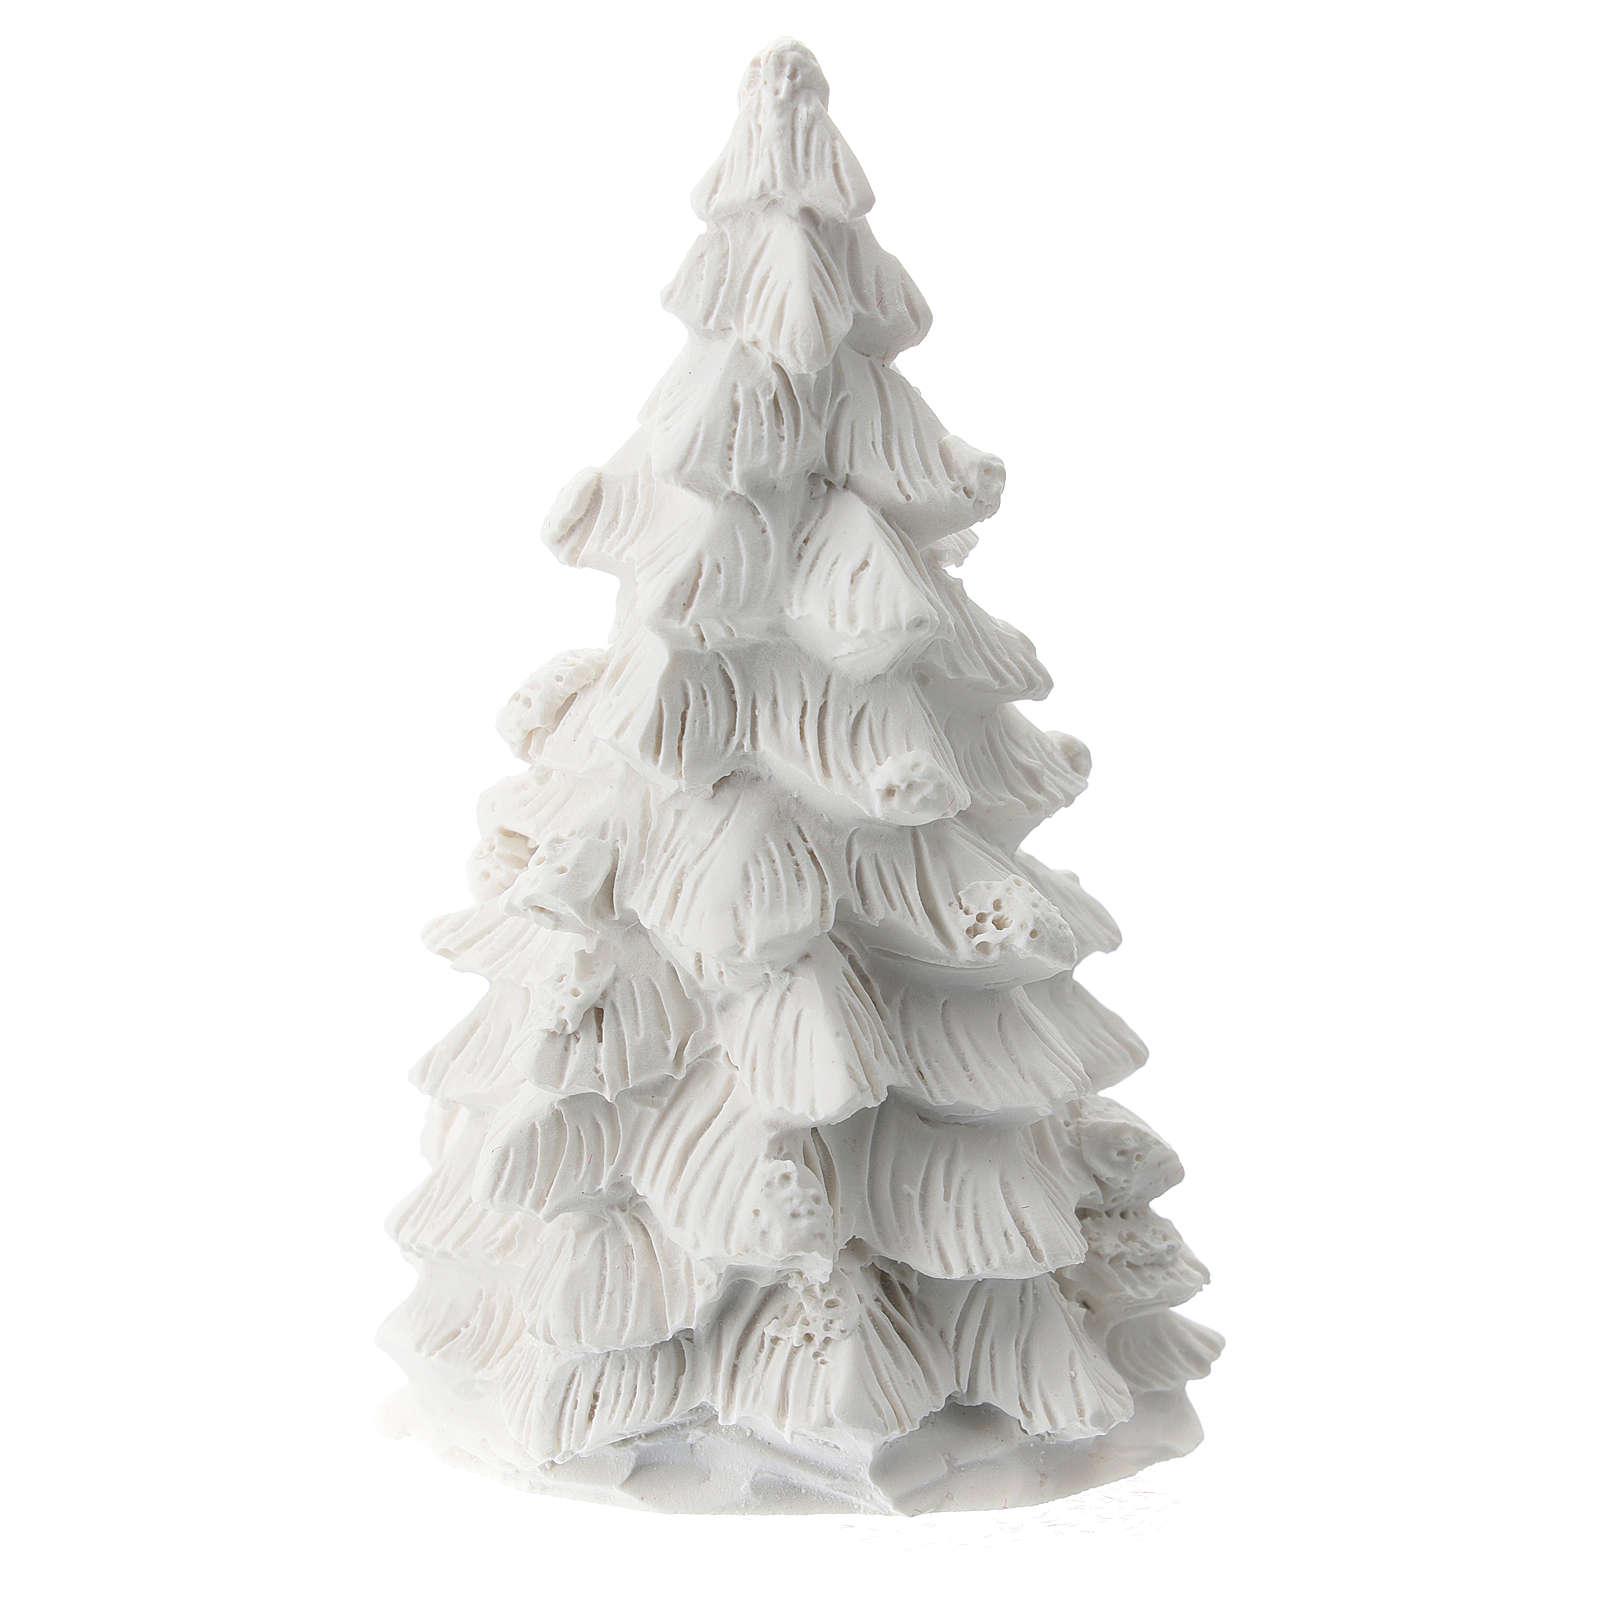 Albero Natale Natività resina bianca 10 cm 3